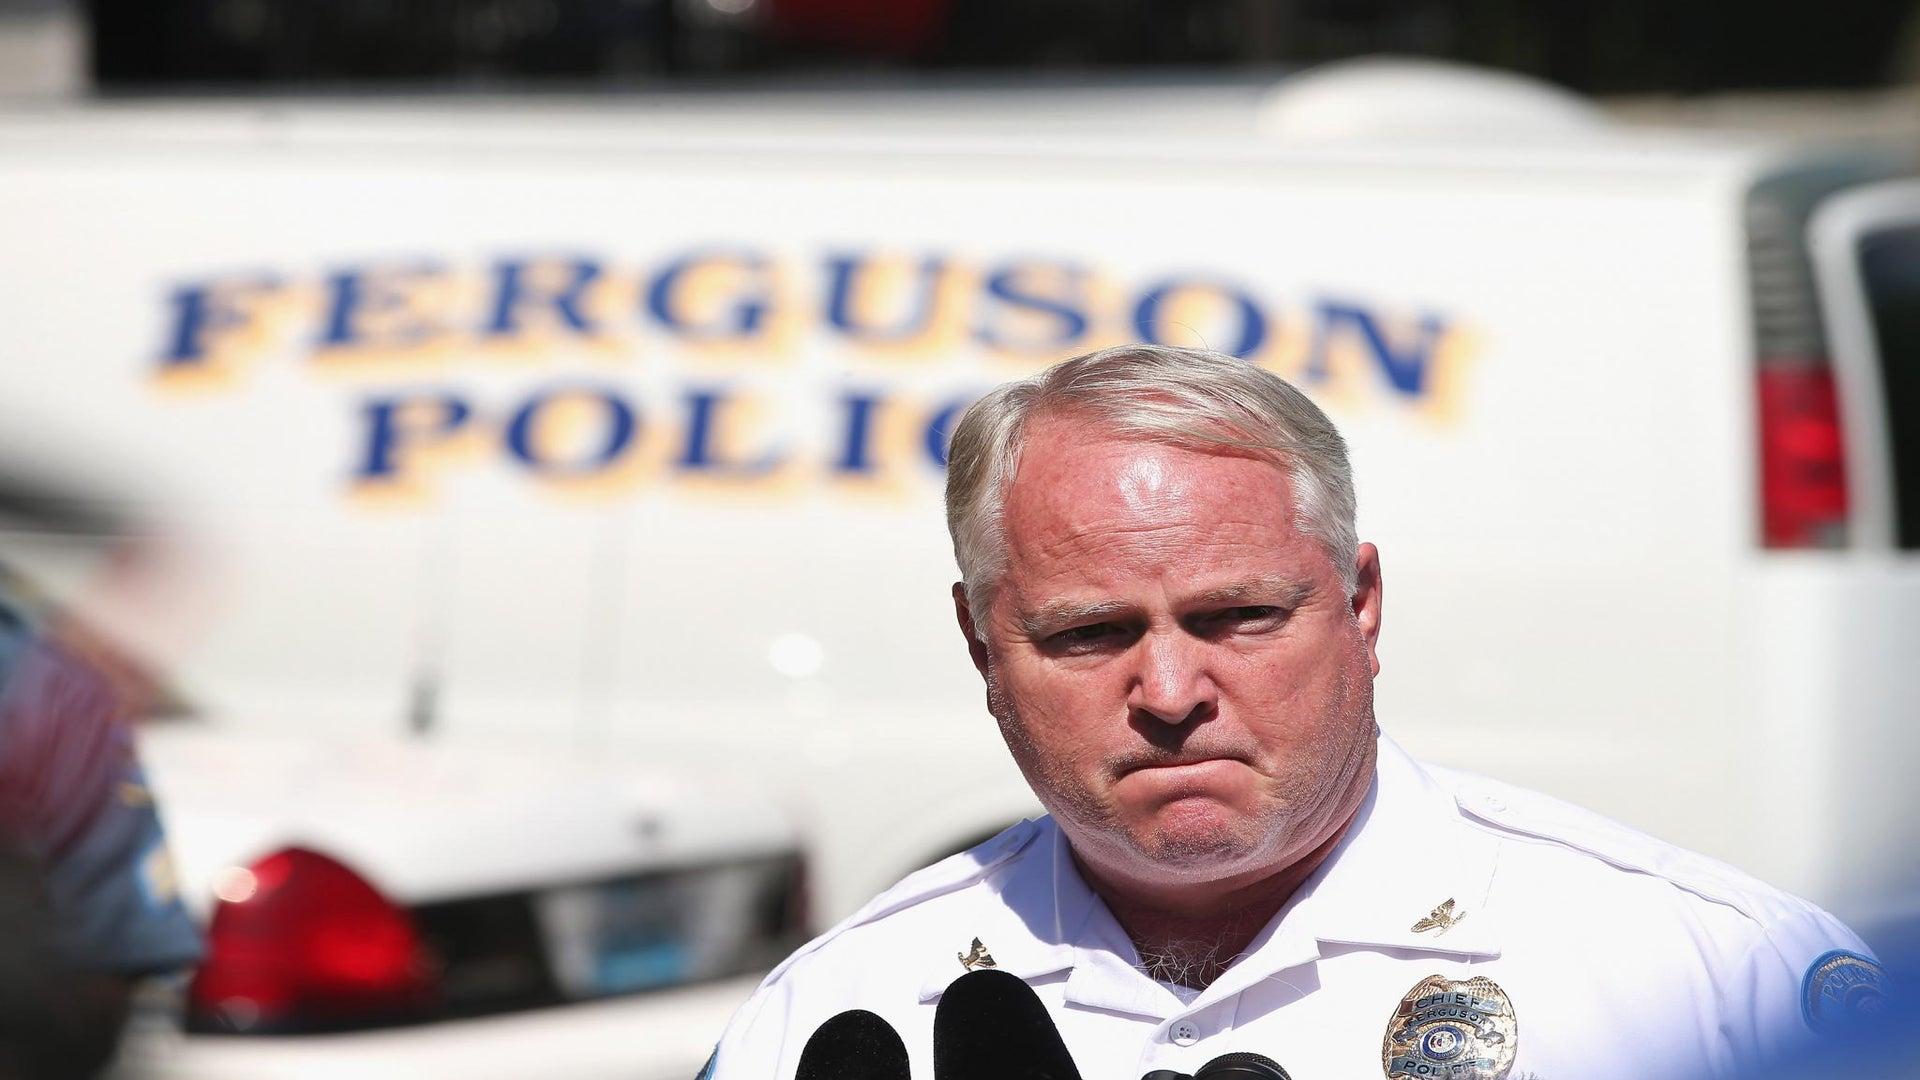 Ferguson City Manager, Police Chief Resign in Wake of DOJ Report